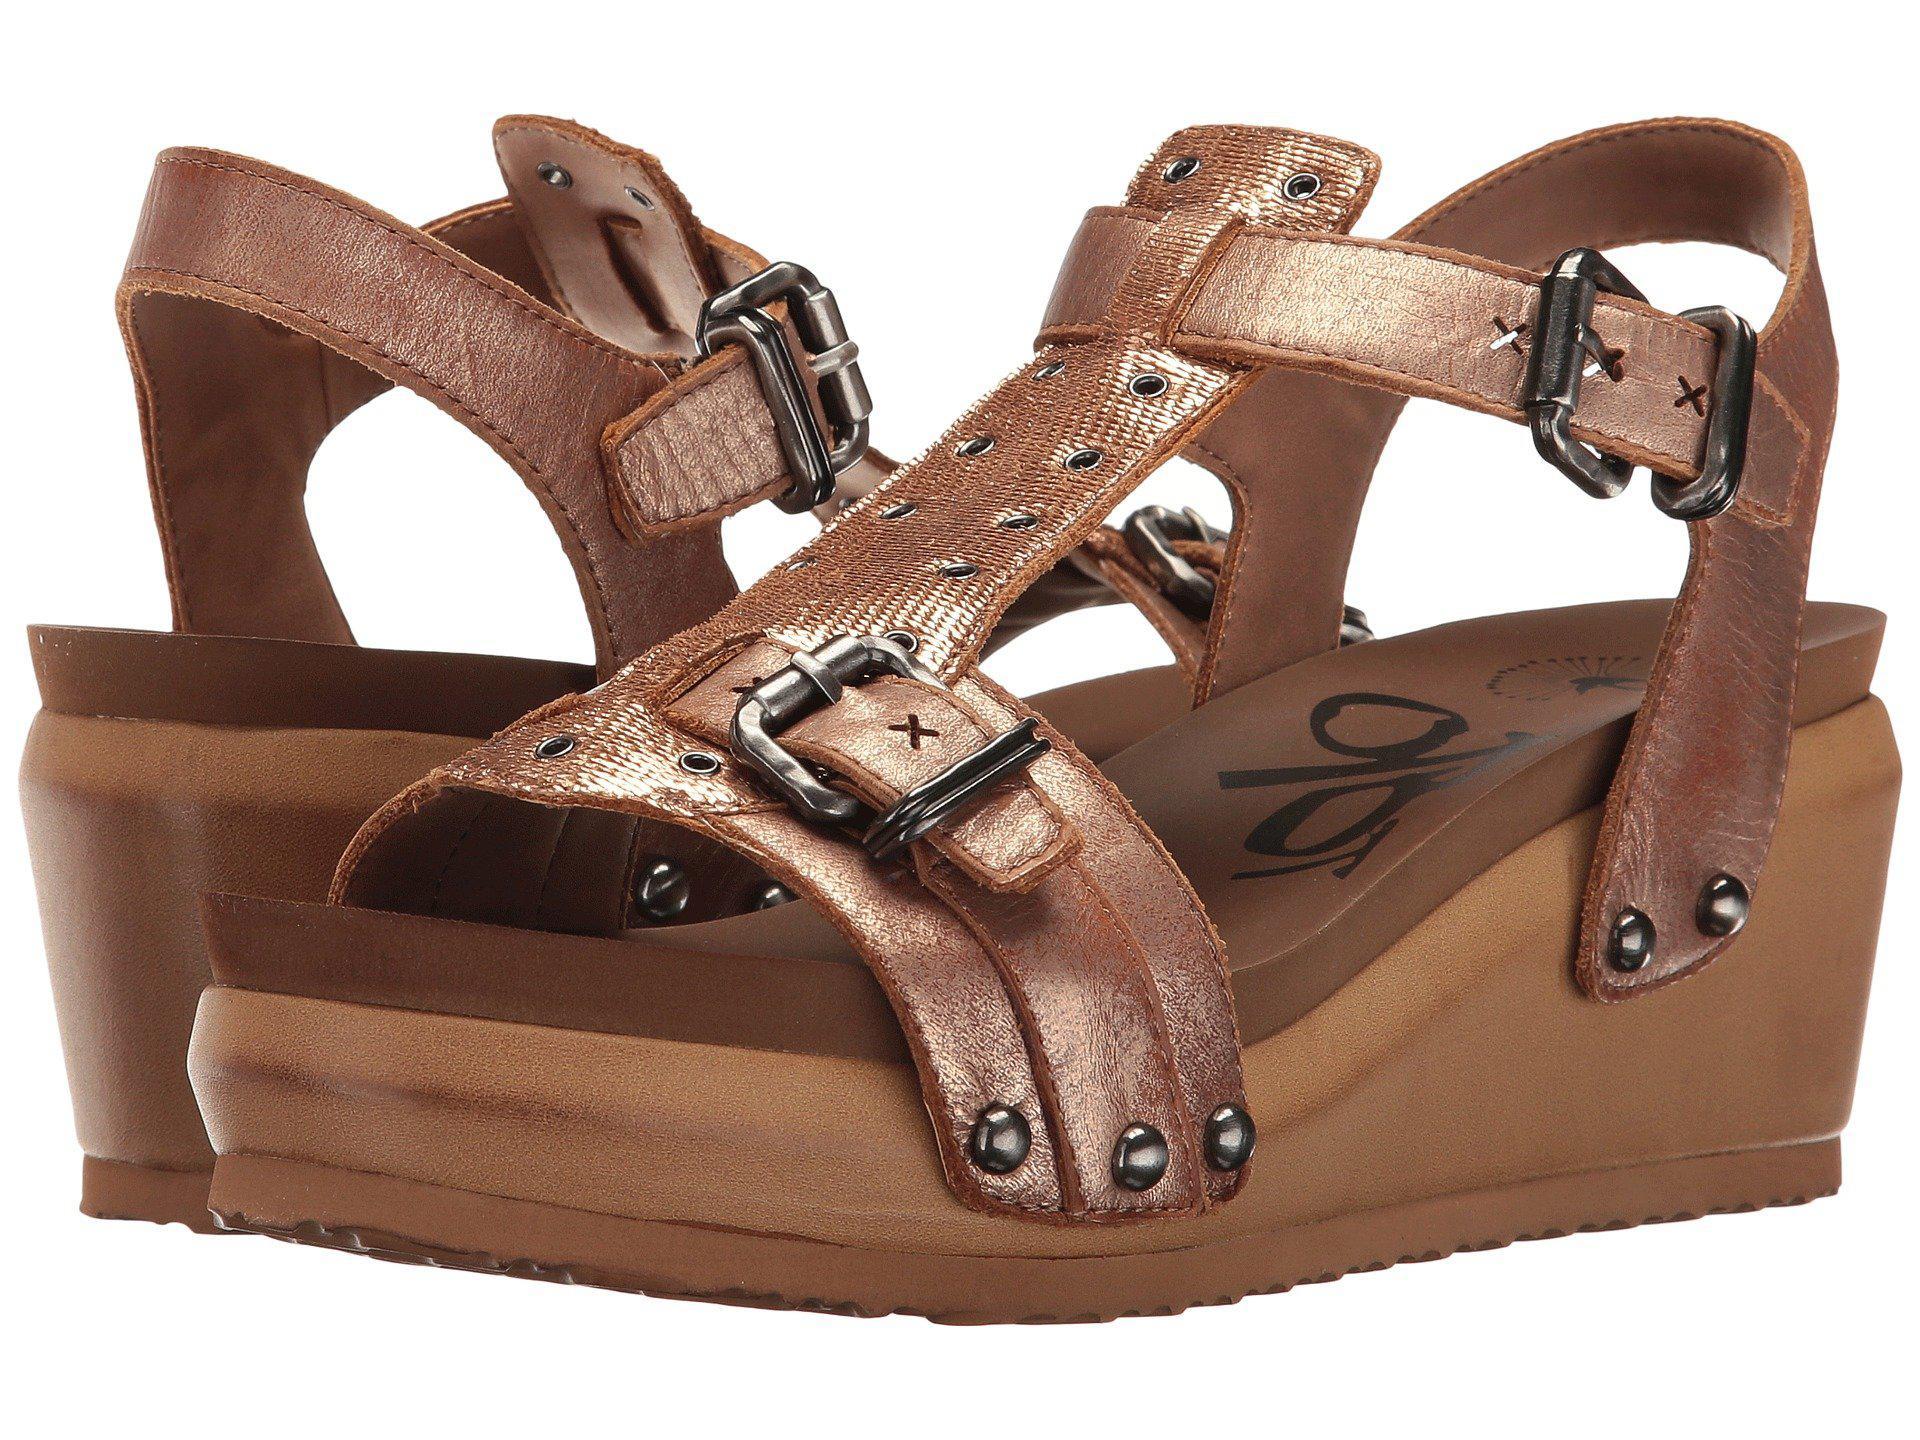 ab4d6ddbc037 Lyst - Otbt Caravan (copper) Women s Wedge Shoes in Brown